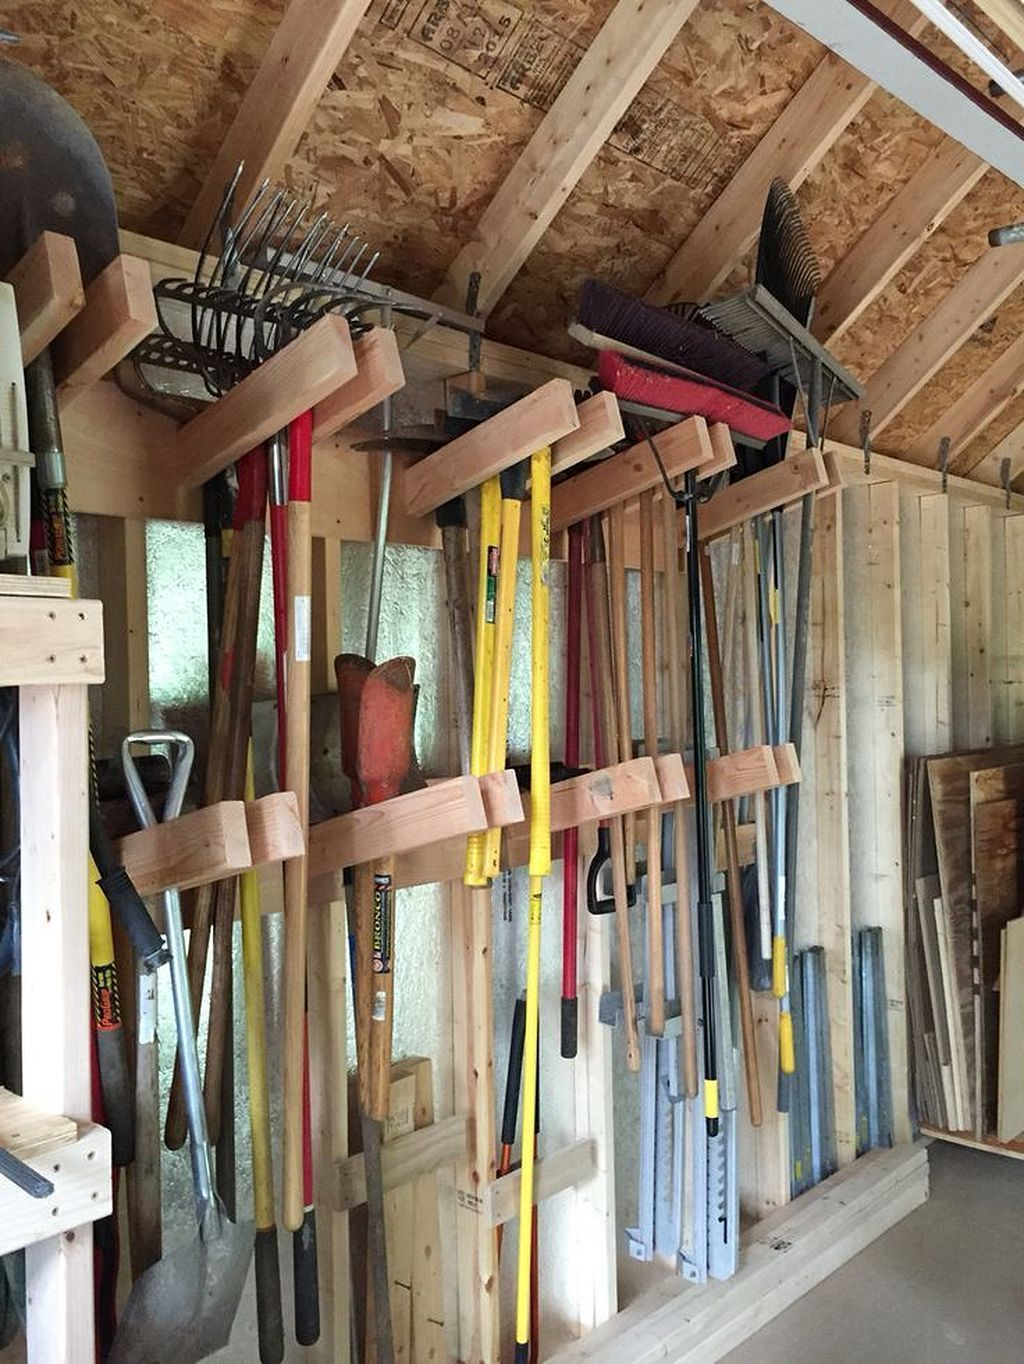 Rangements en 2020 | Rangement outils jardin, Rangement outils, Rangement